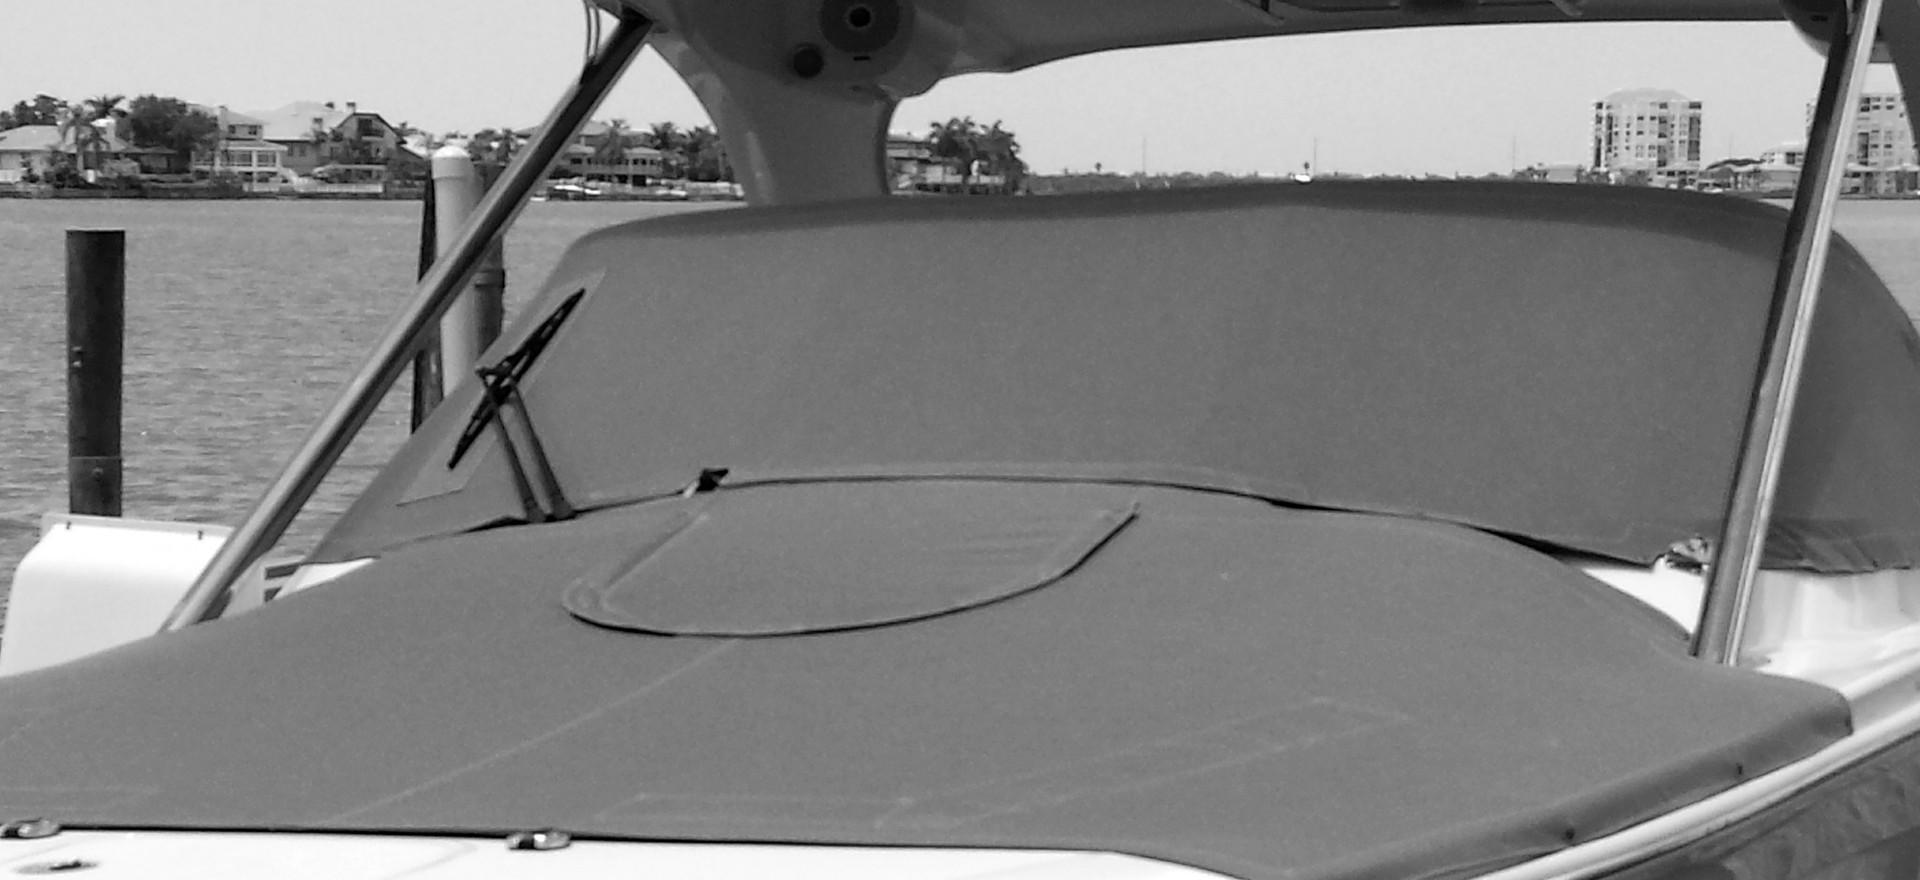 mooring covers with zipper.jpg